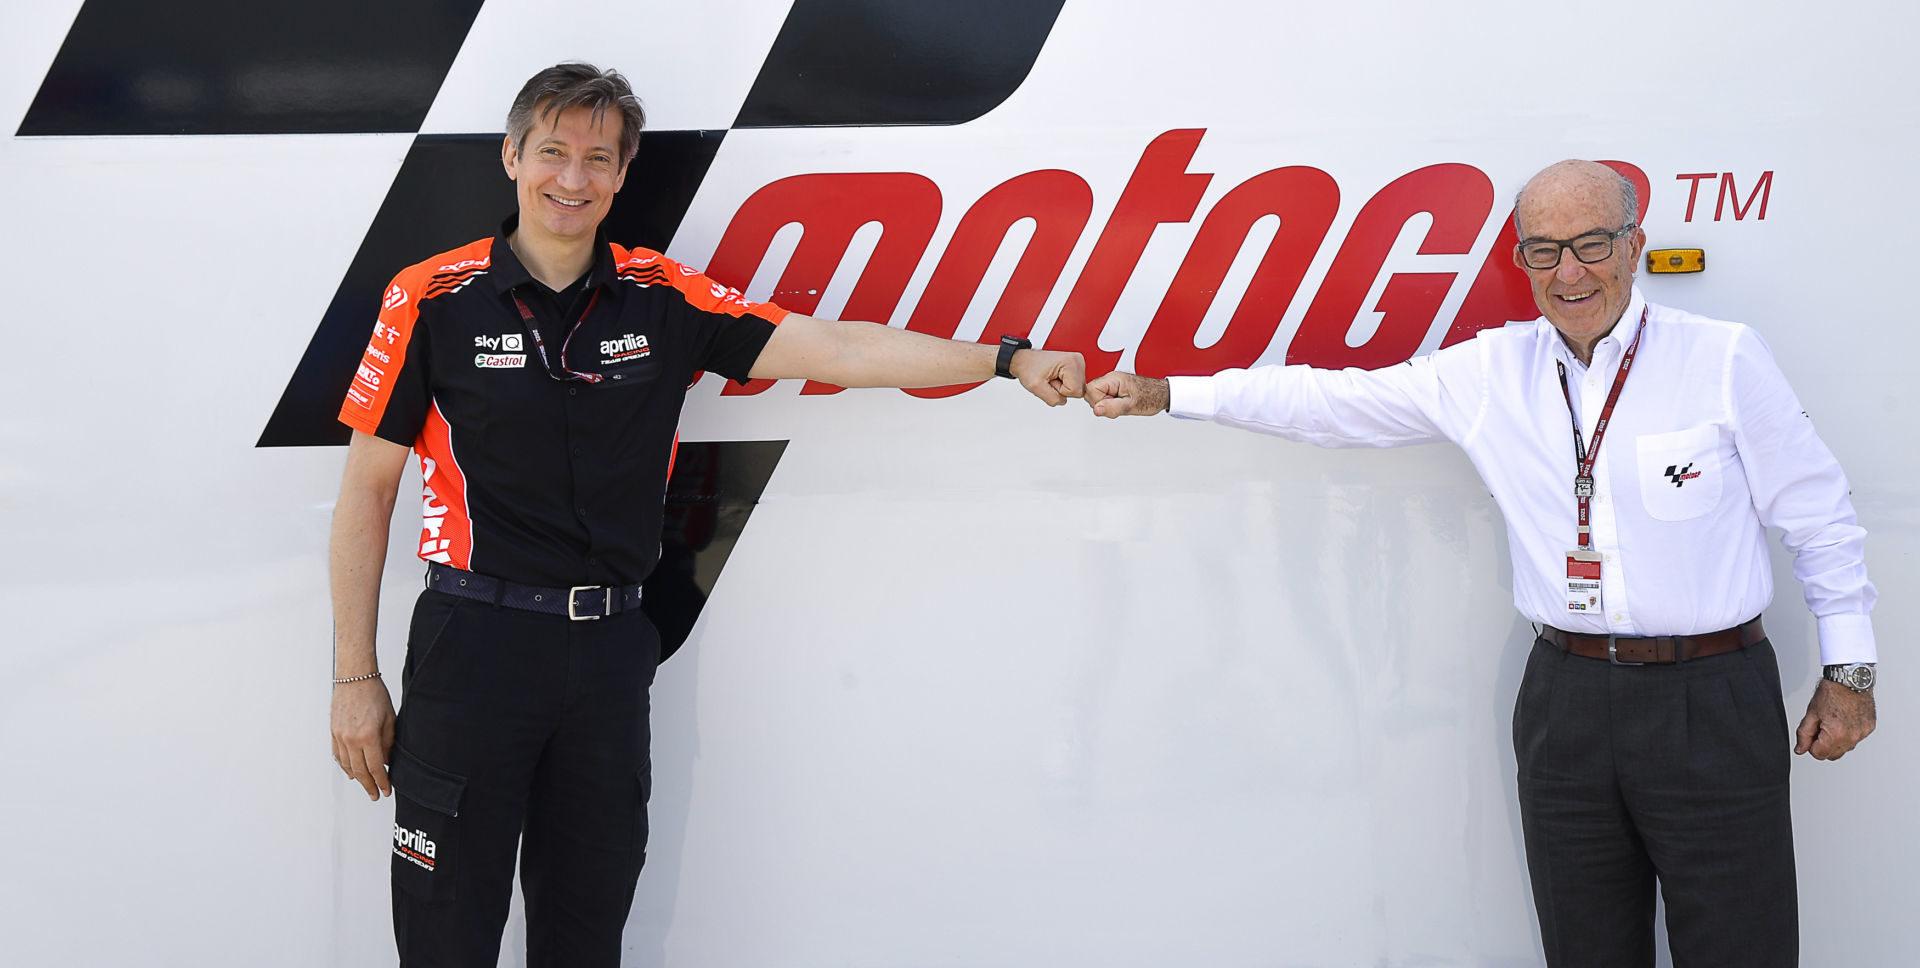 Aprilia Racing CEO Massimo Rivola (left) with Dorna CEO Carmelo Ezpeleta (right). Photo courtesy Dorna.